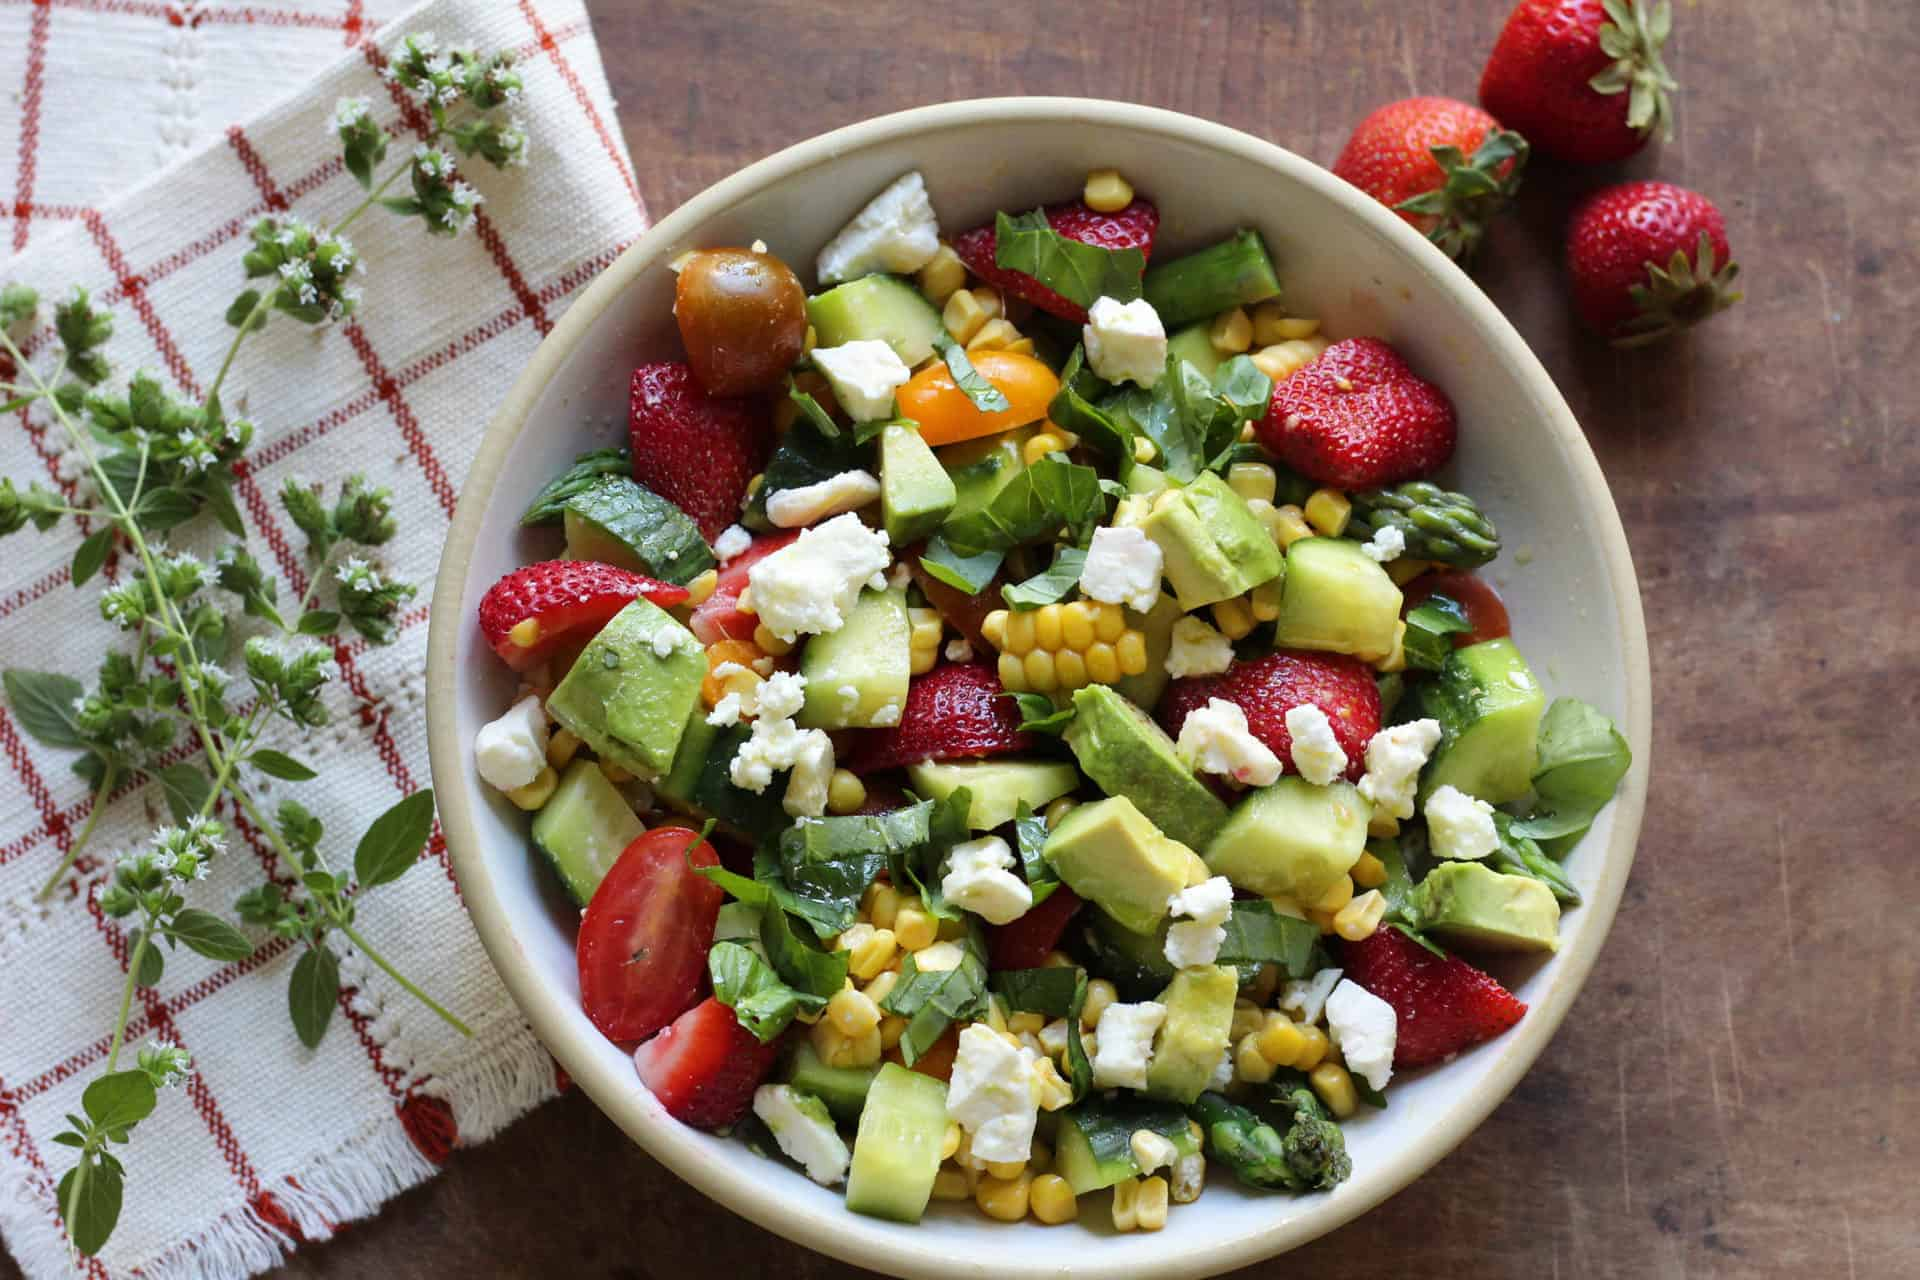 Summer, Salads, Quick & Easy, Dinner, Sides, Corn, Avocado, Strawberries, Vegetarian, Gluten Free